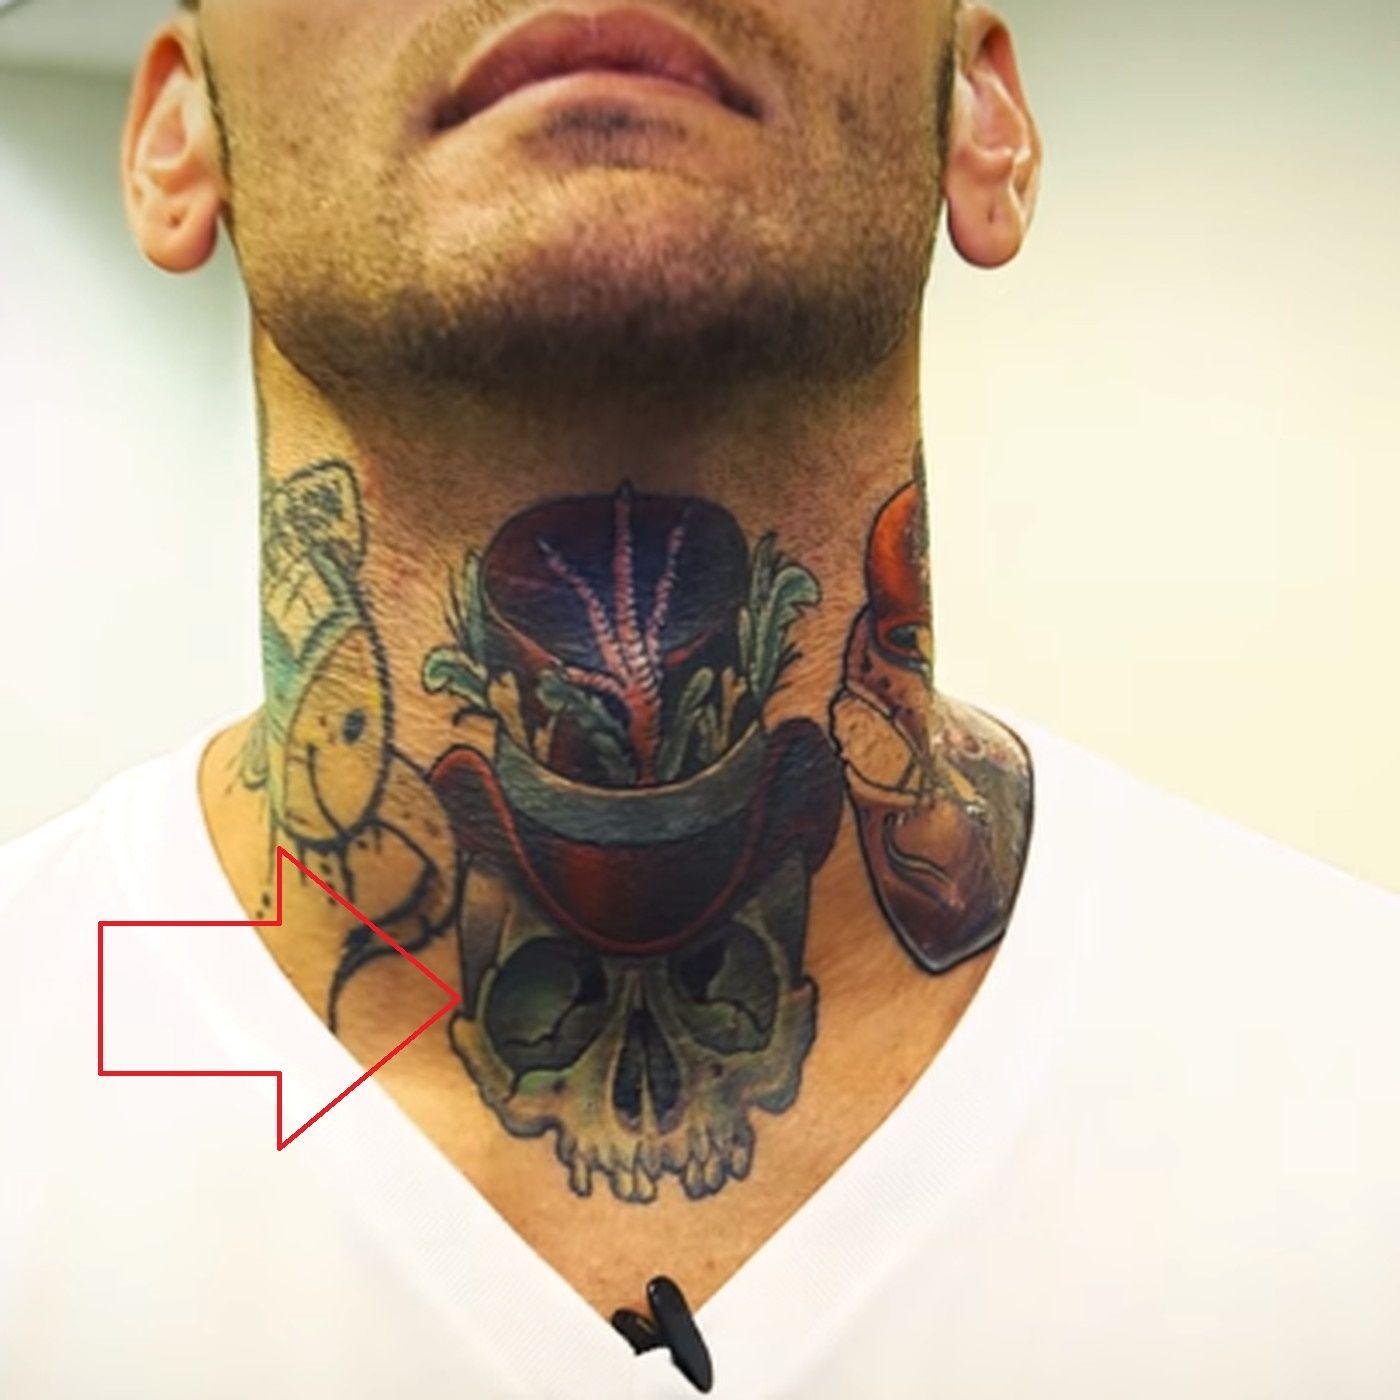 GravesThroat-Tattoo-